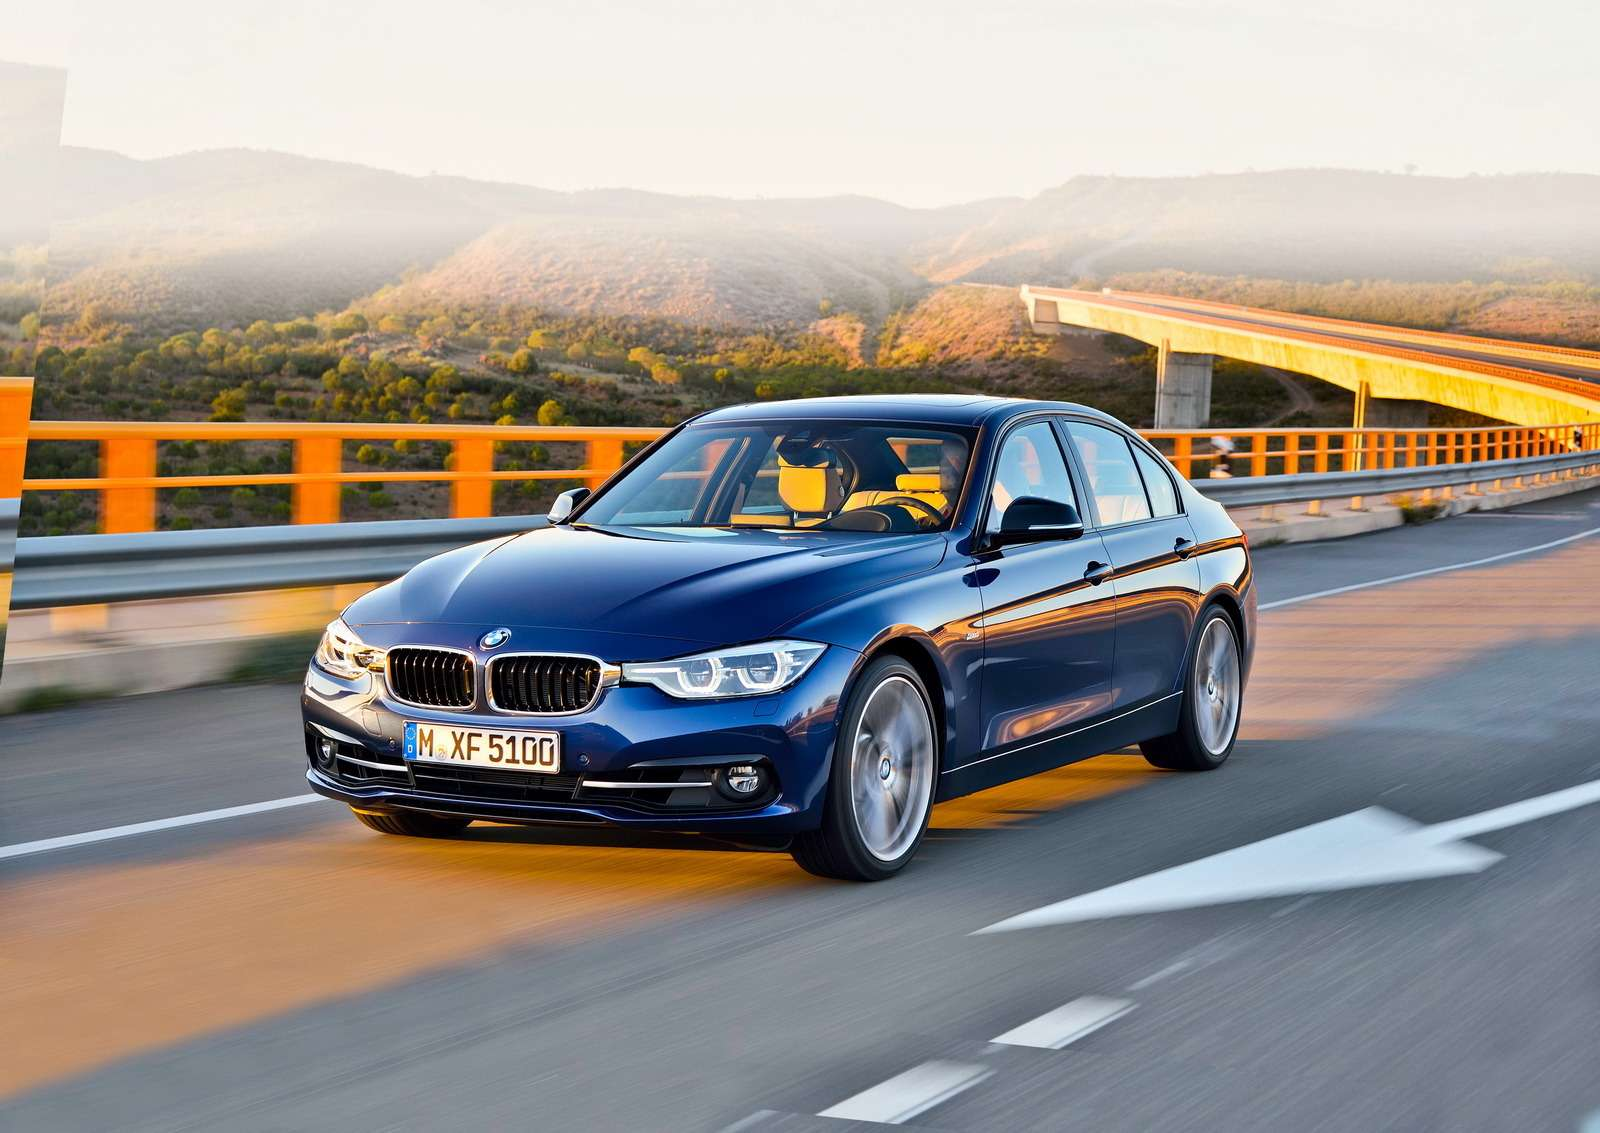 00BMWX1-BMW3 zr09-15_новый размер